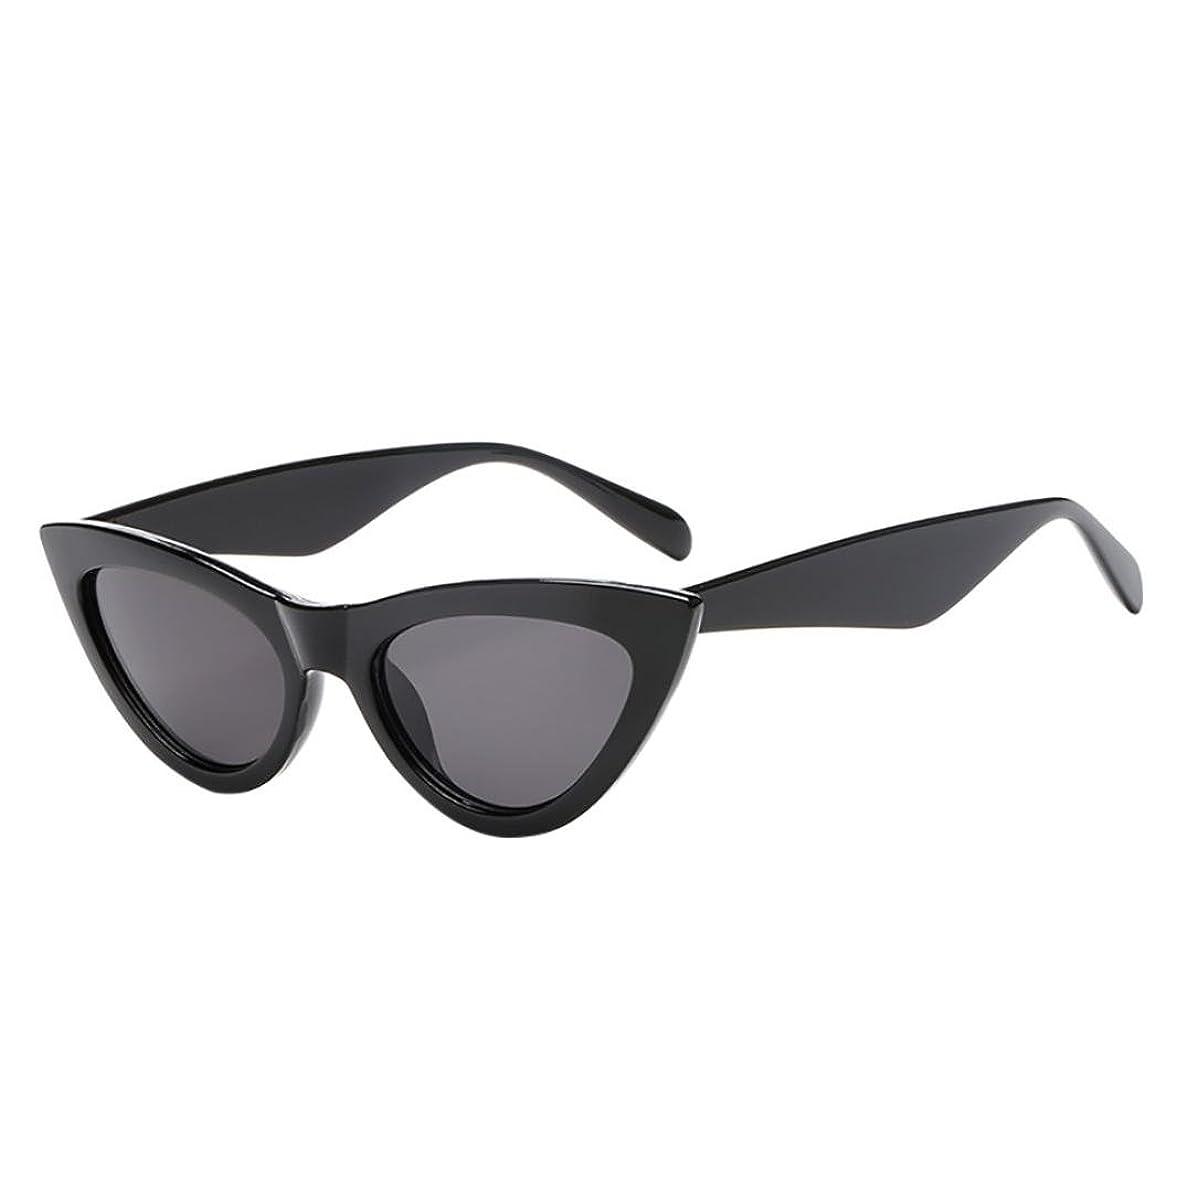 Fheaven Unisex Fashion Retro Vintage Cat Eye Sunglasses Rapper Grunge Glasses Eyewear (A)